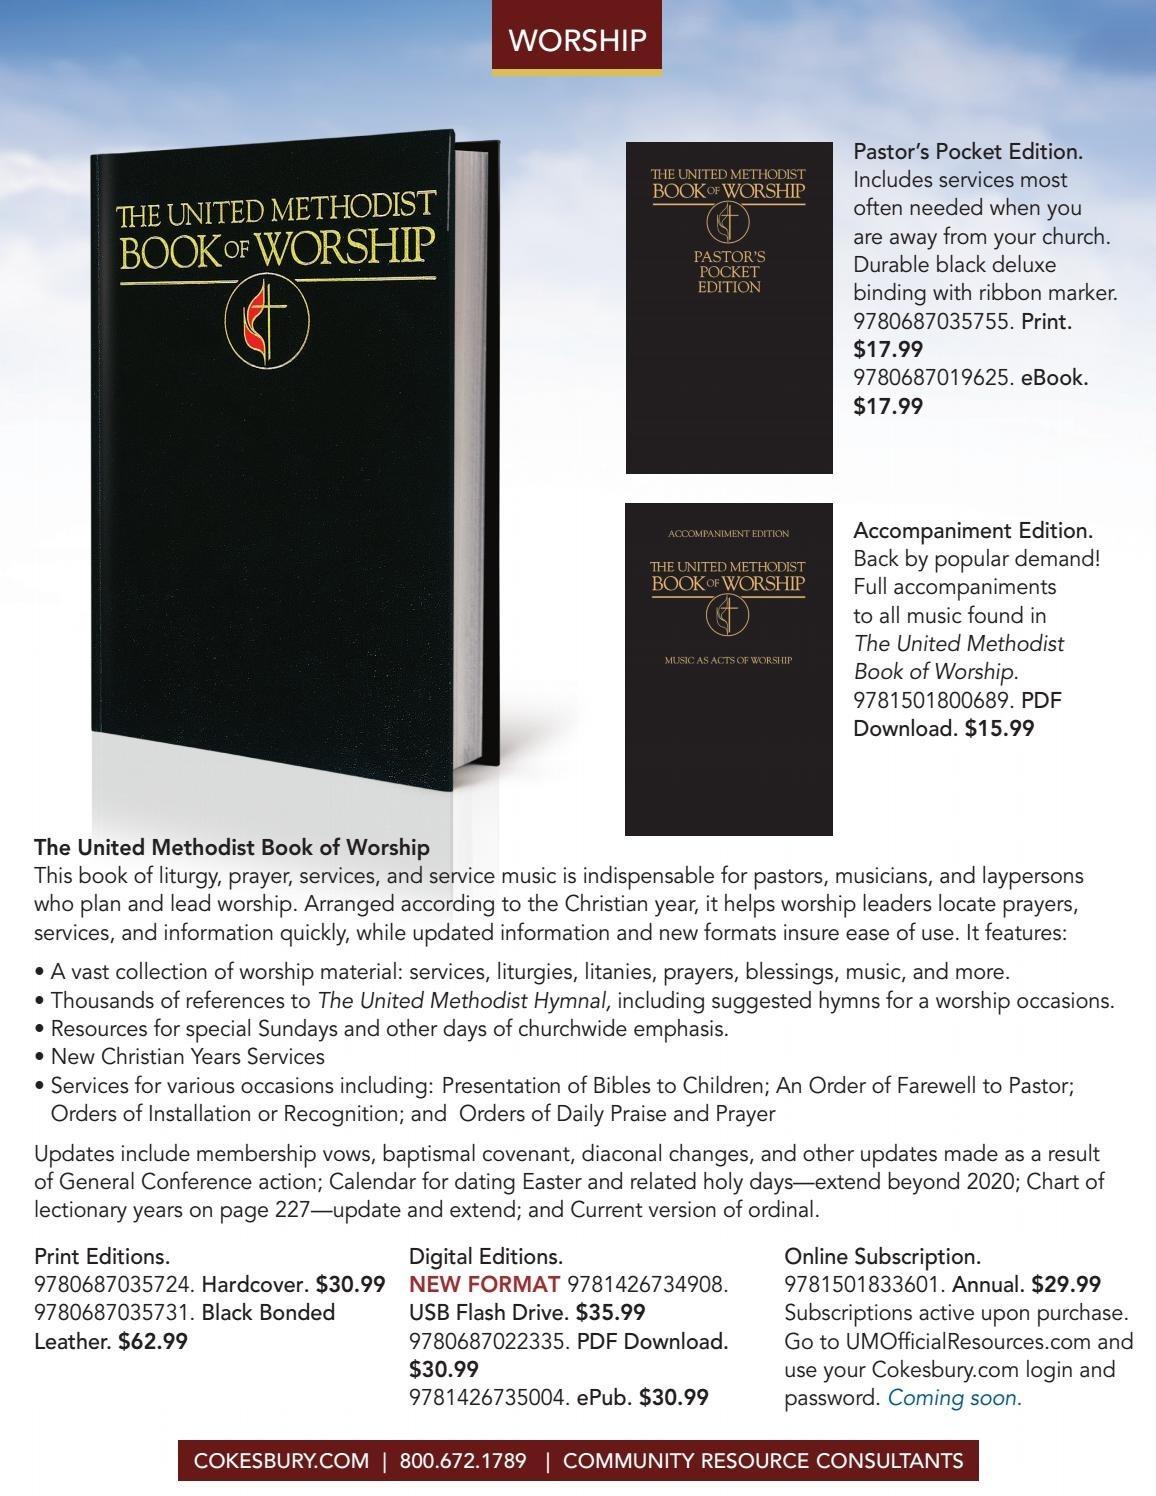 Methodist Lectionary Calendar 2020 - Template Calendar Design  Methodist Church 2021 Liturgical Calendar